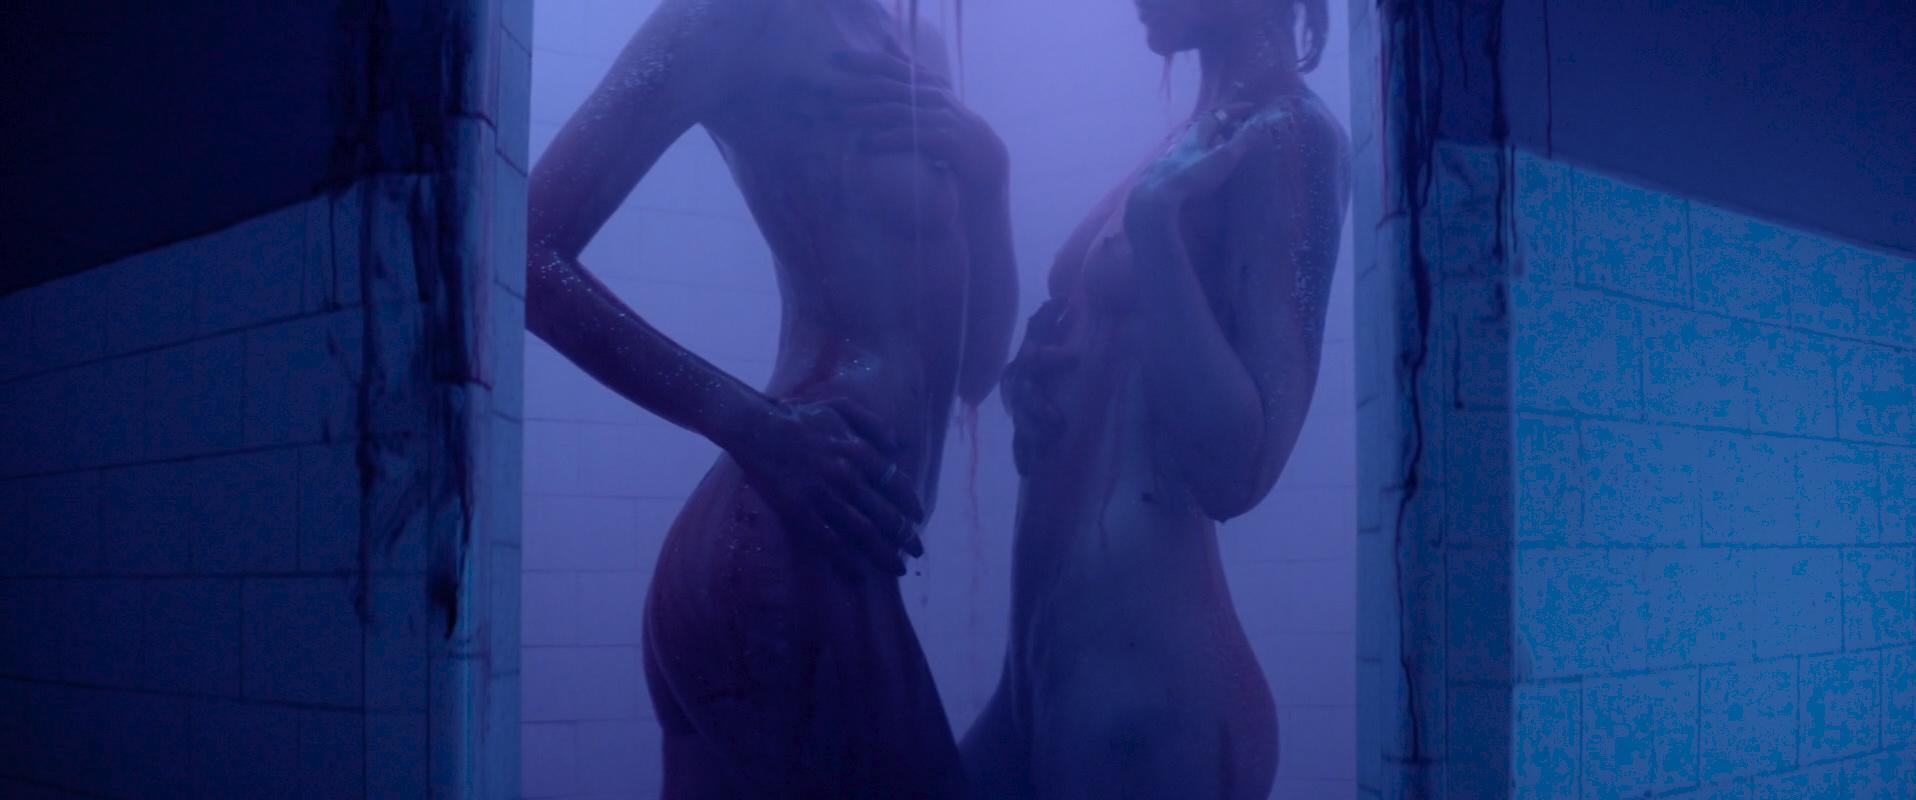 Elle Fanning hot Jena Malone, Bella Heathcote and Abbey Lee nude, topless, bush- The Neon Demon (2016) 1080p WEB-DL (4)